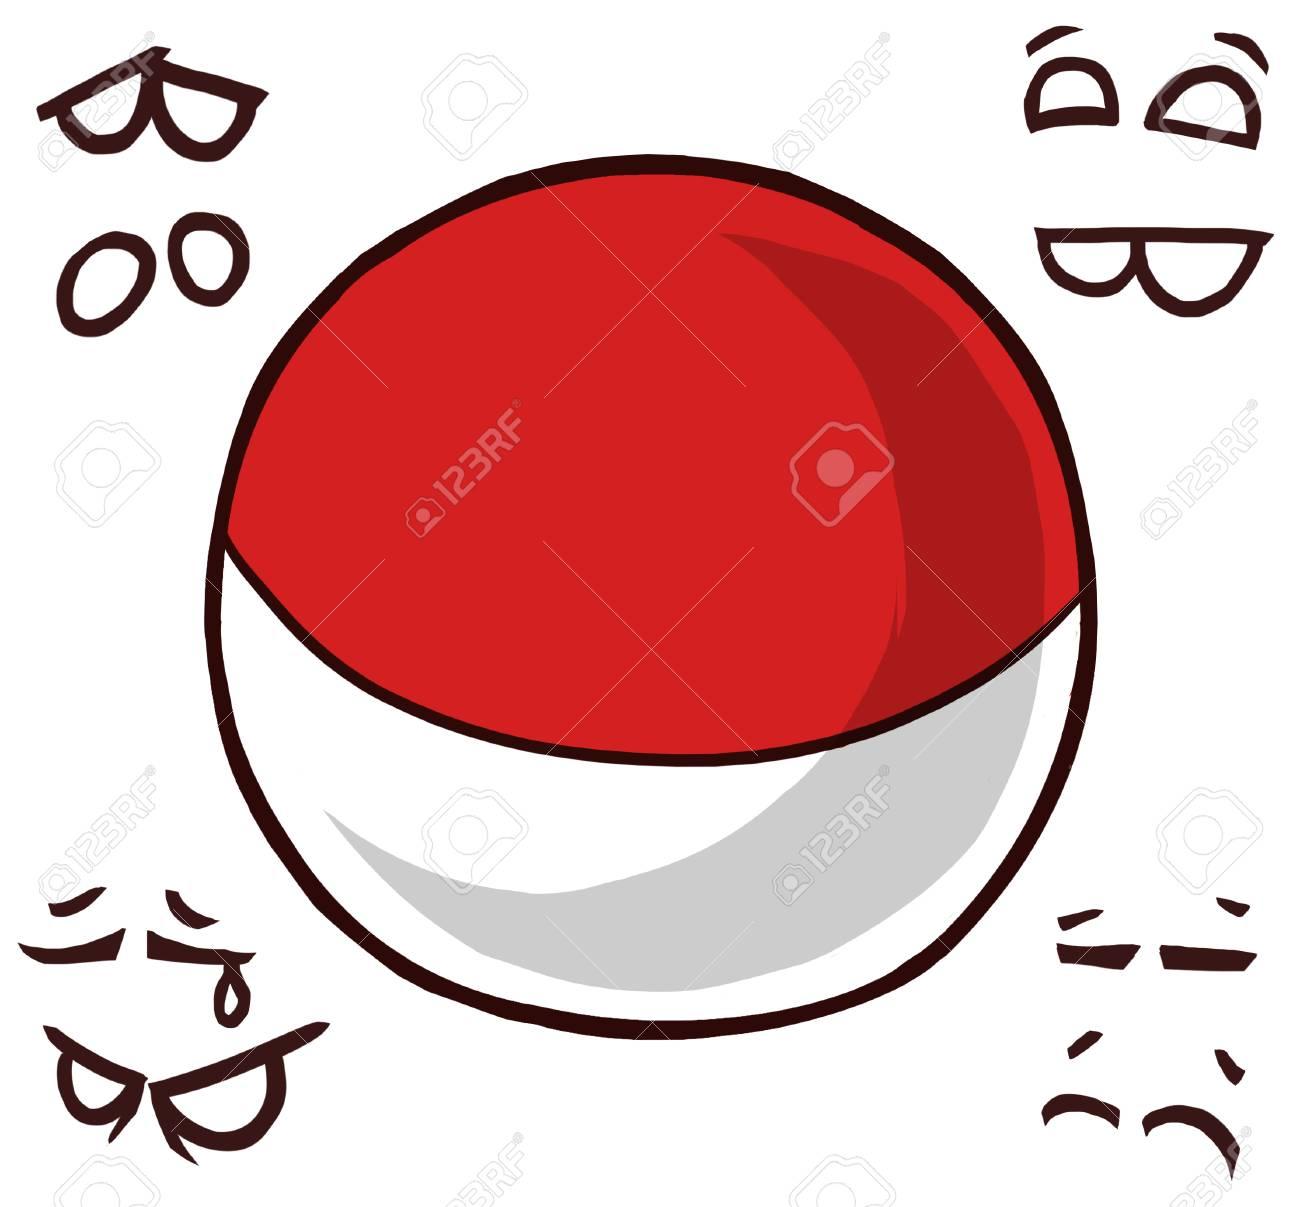 Monaco country ball - 110723170